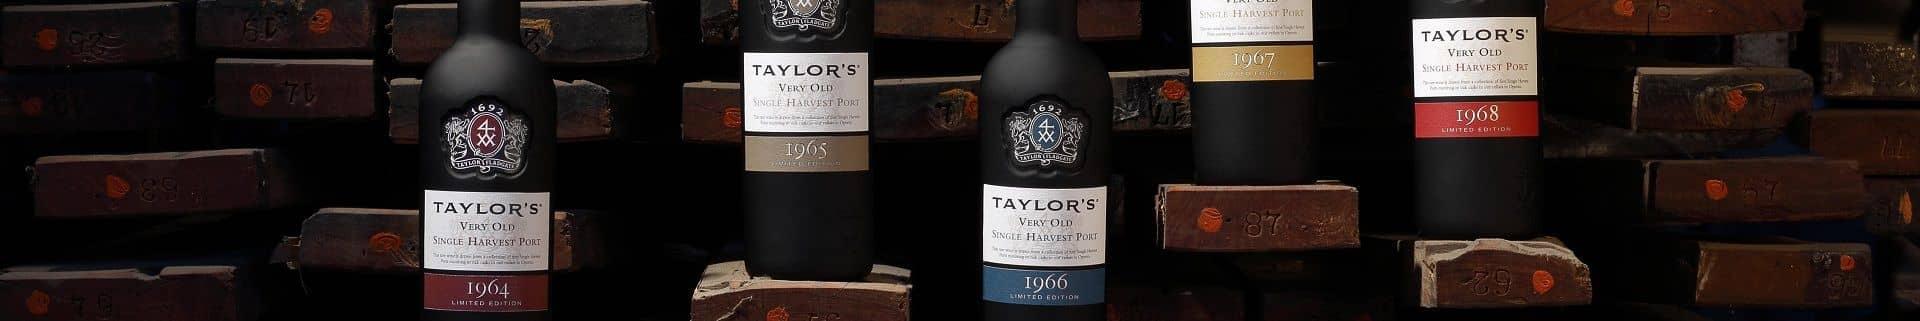 Single Harvest Port Wine bottles from Taylor's